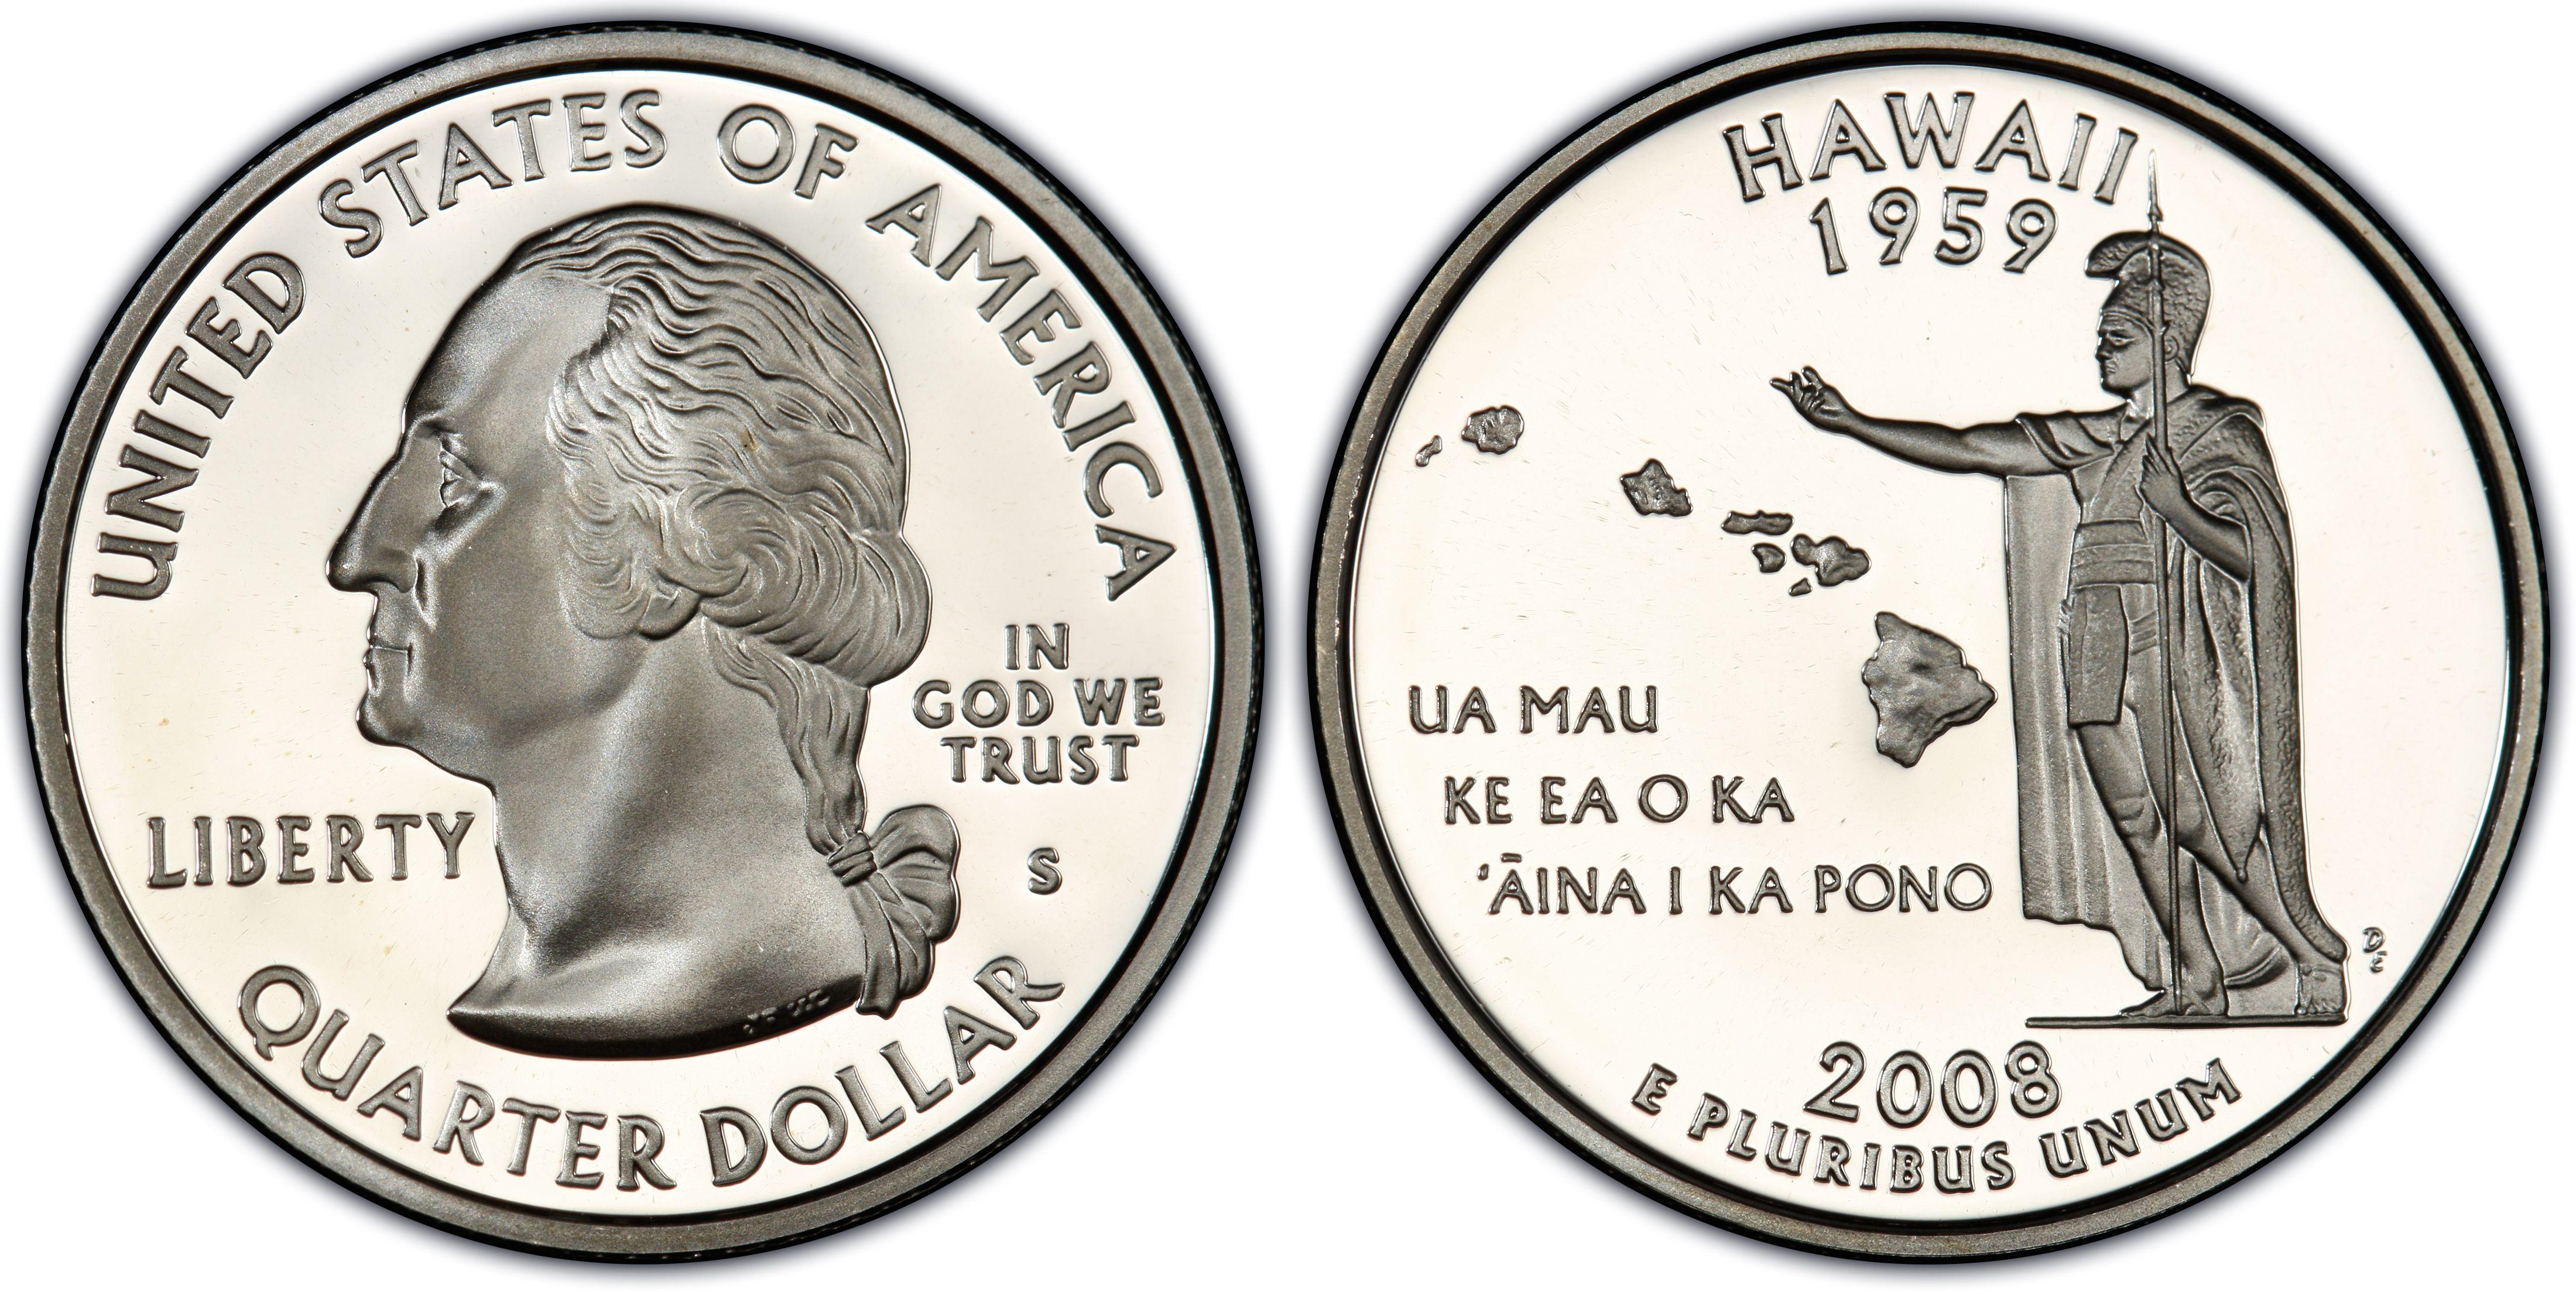 2008 Barack Obama PCGS Slabbed BU HAWAII QUARTER DOLLAR.